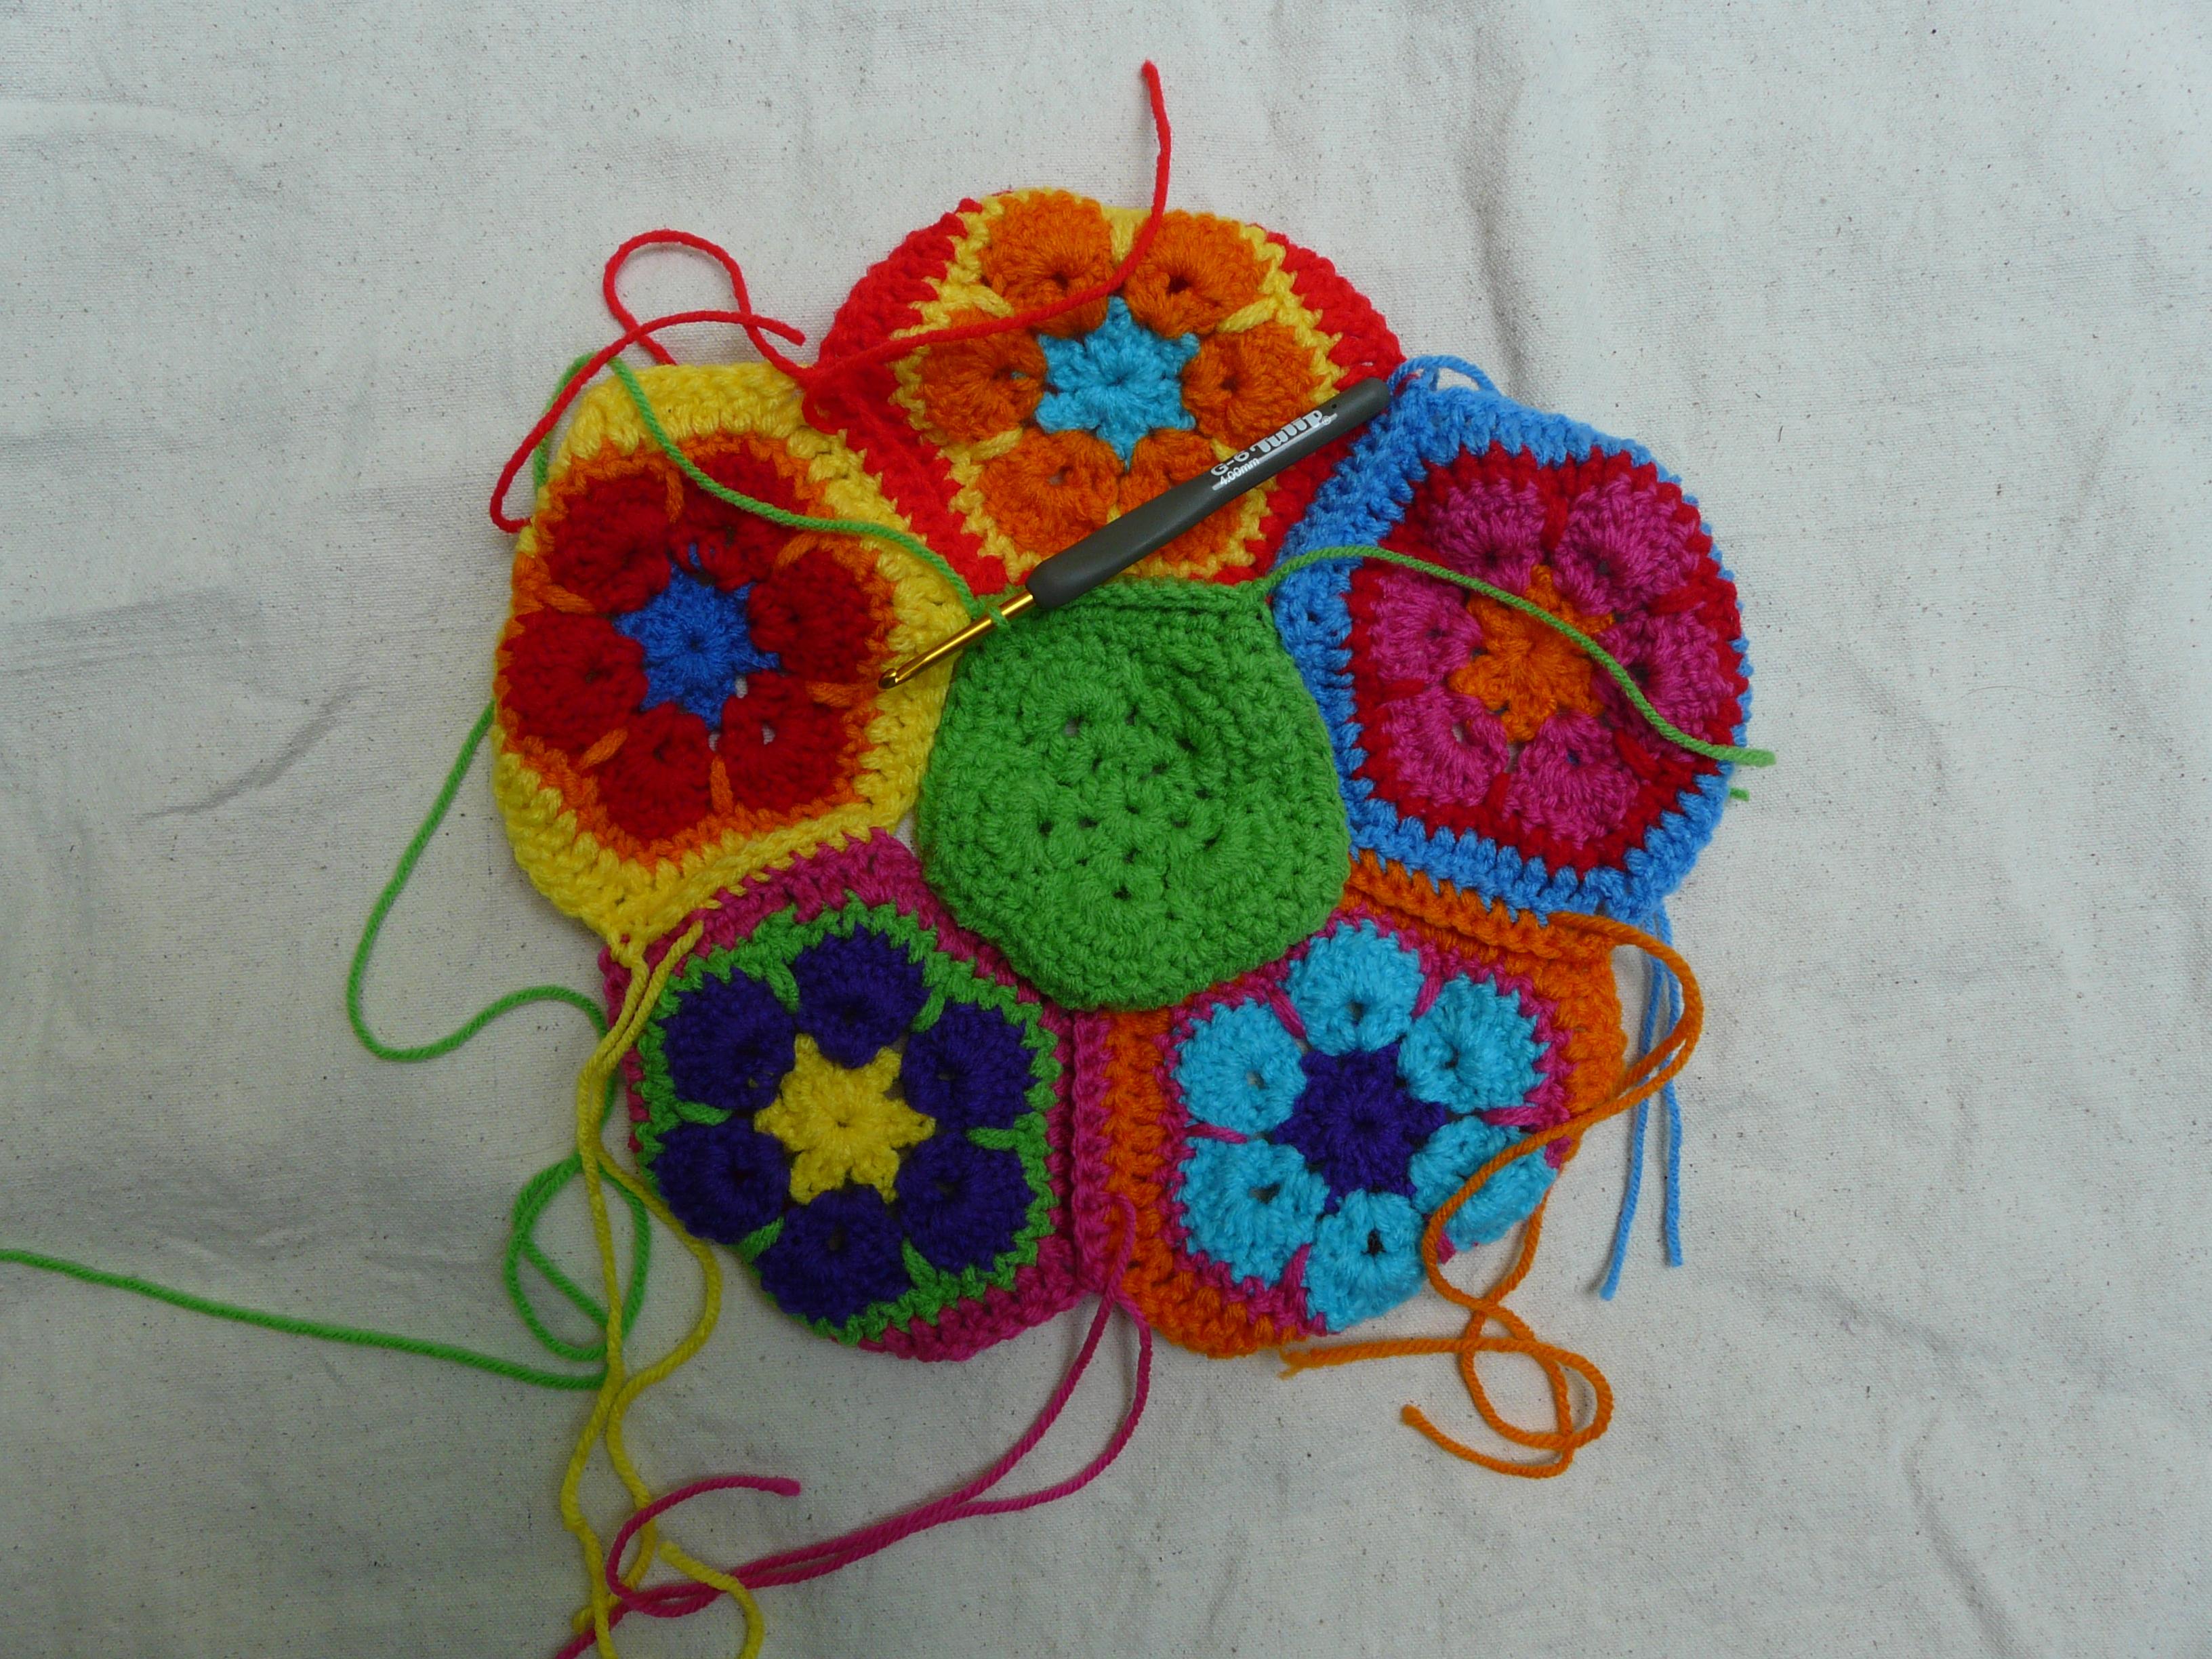 Assembling the African Flower soccer ball - Crochetbug